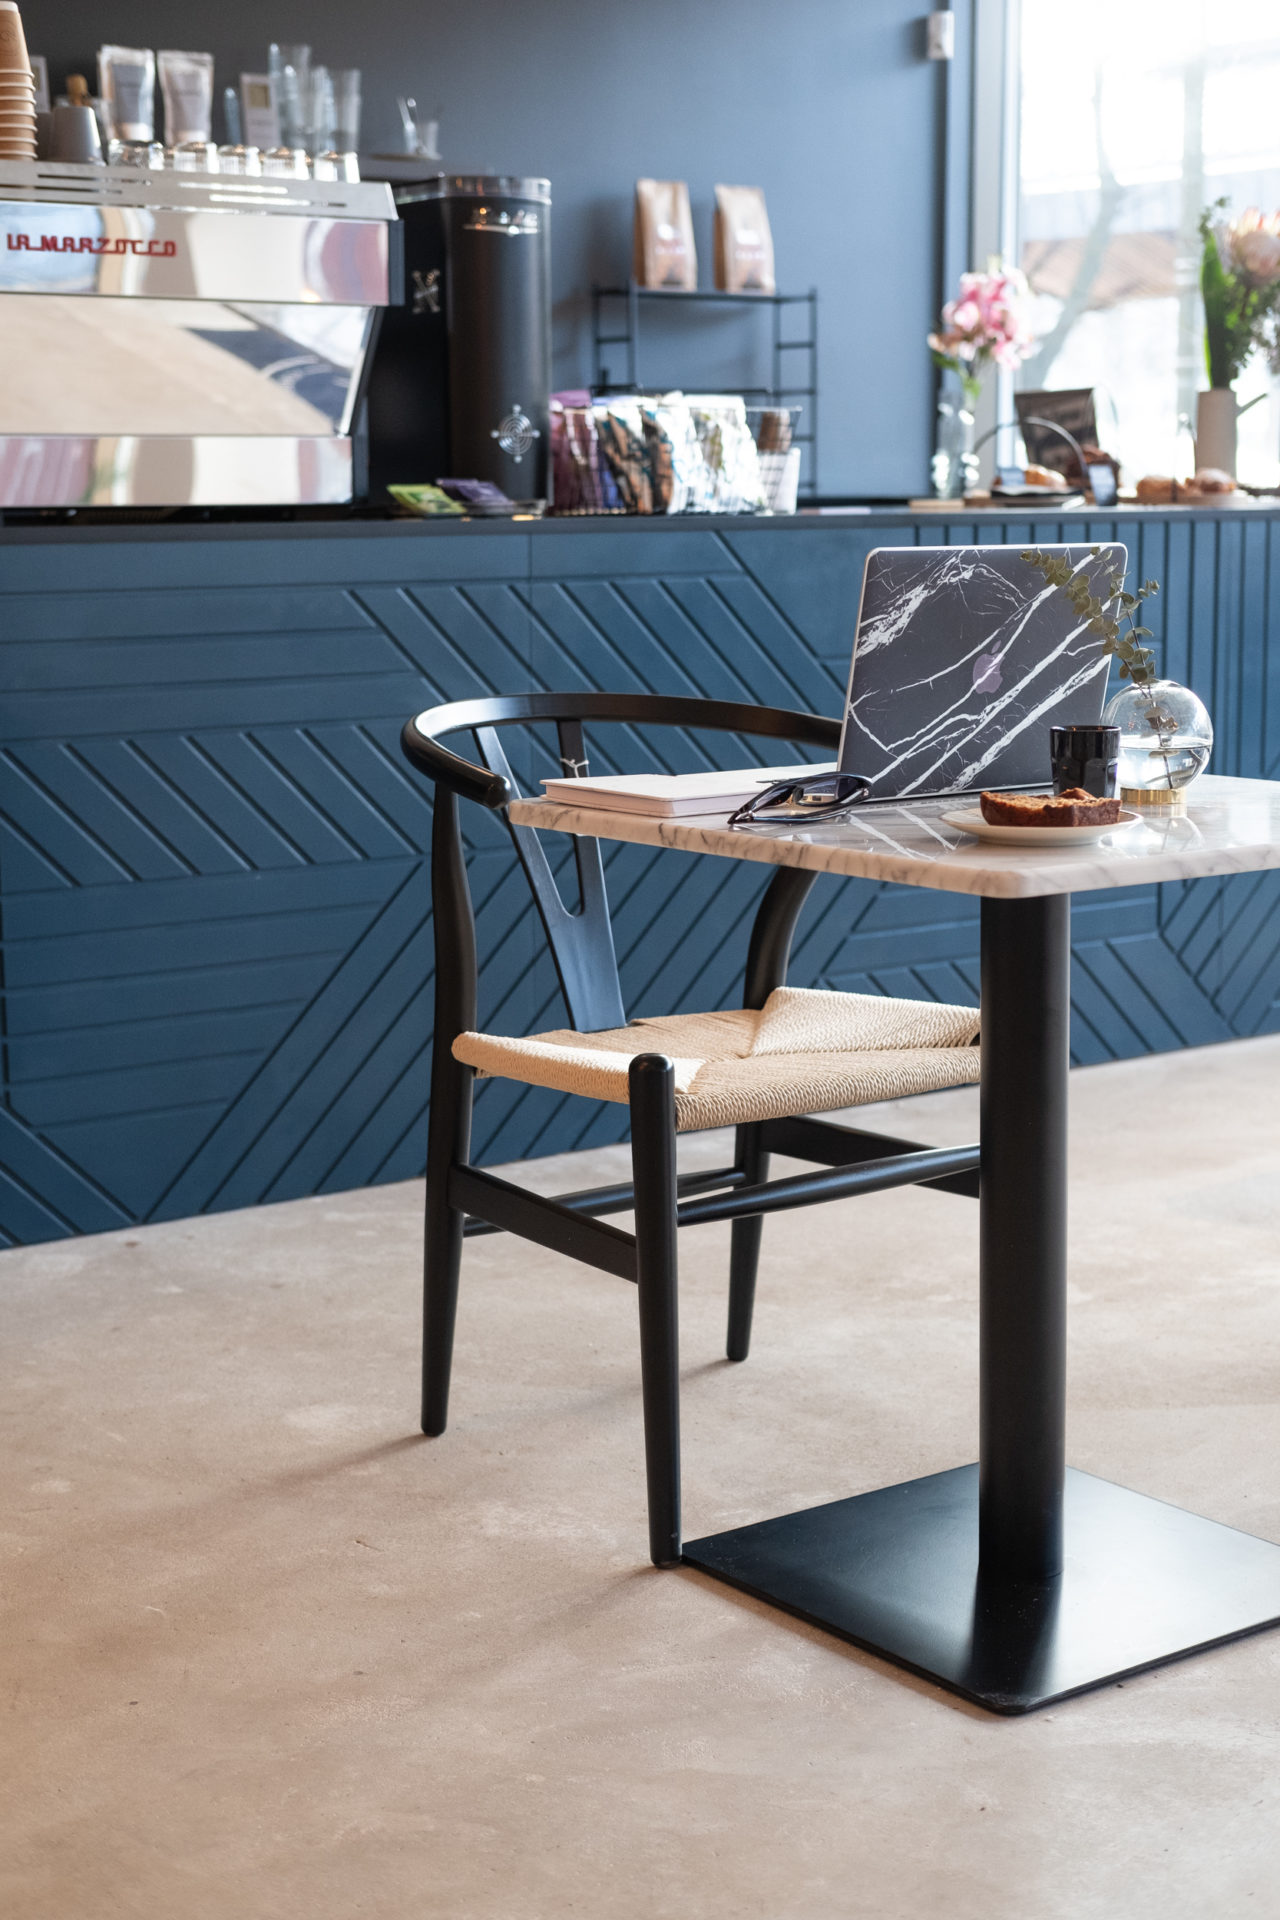 Nordic Design Home Coffee Bar - Kenneth Pert